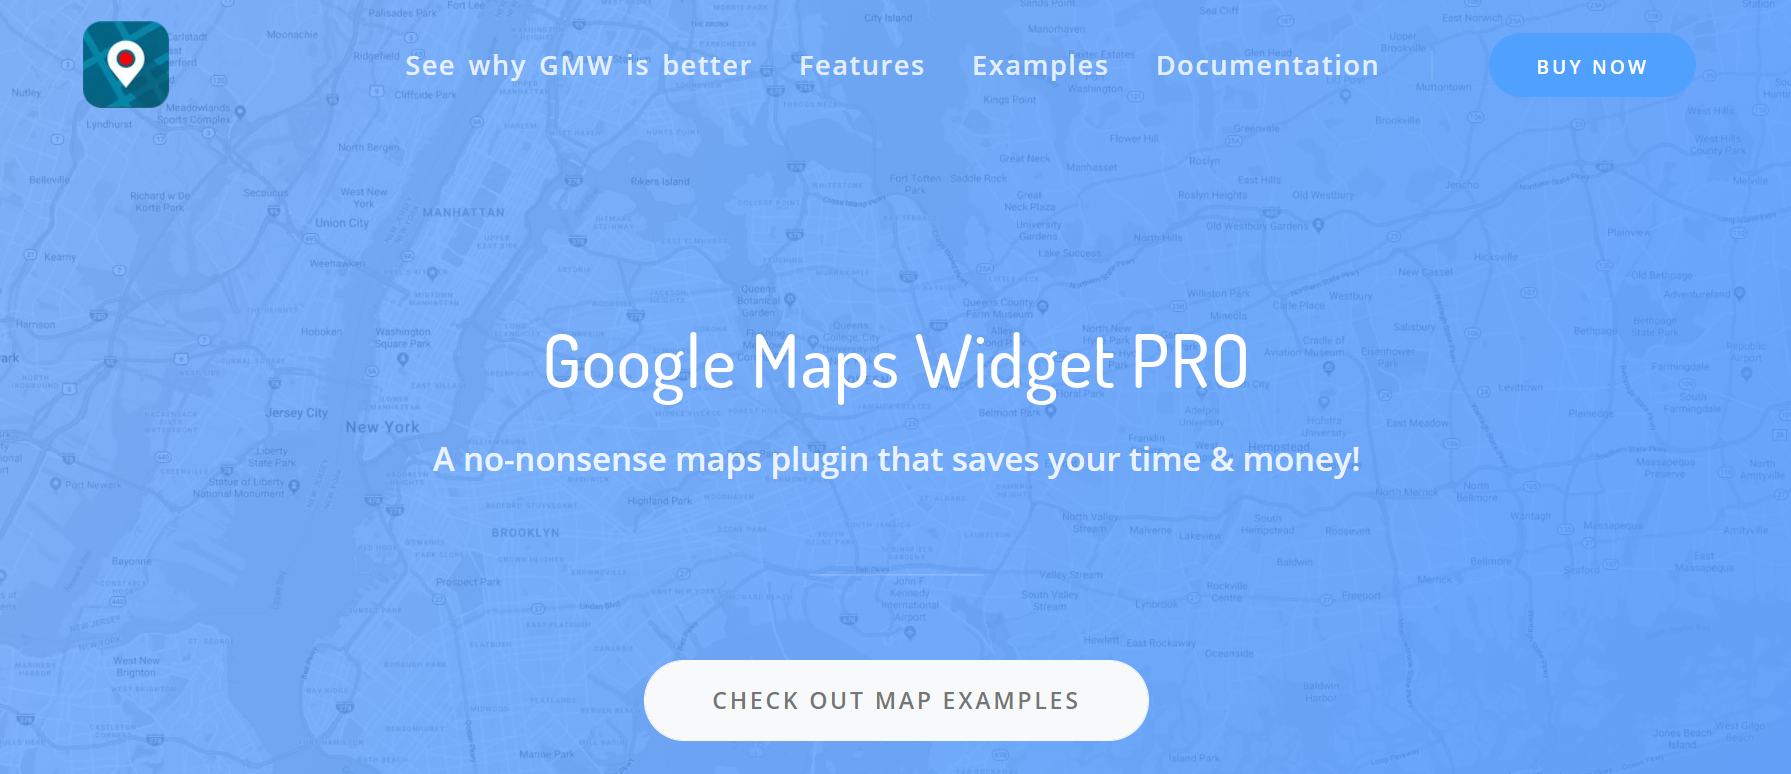 Google Maps Widget Pro homepage